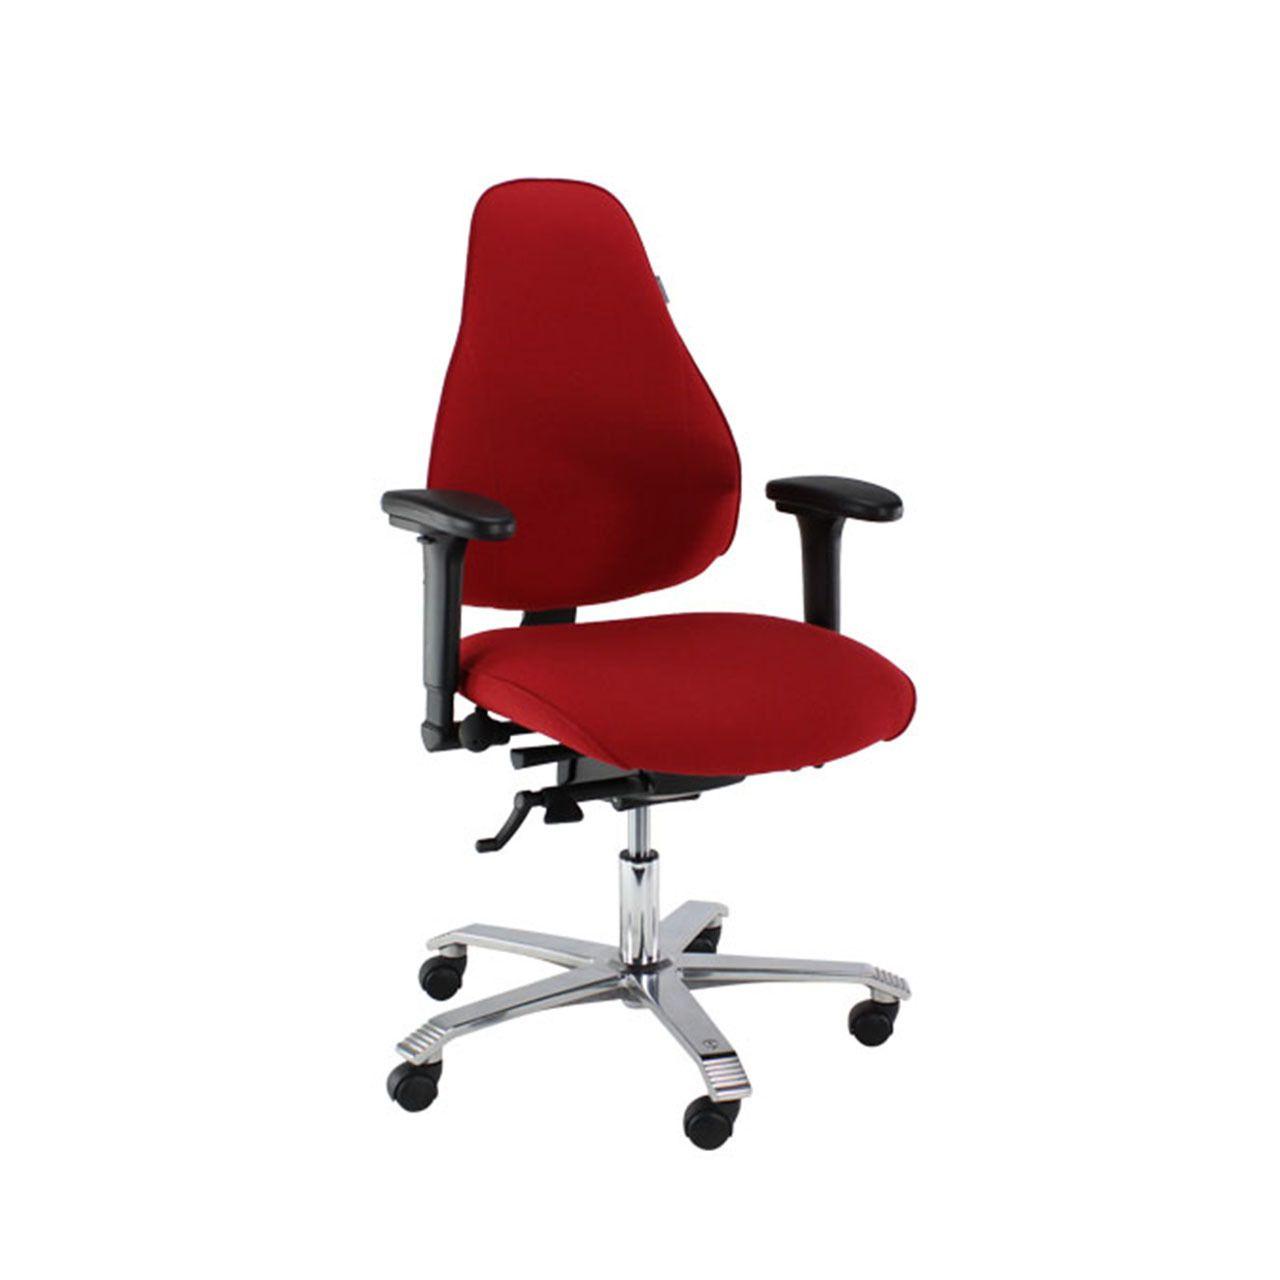 Score 5100 medium bureaustoel STKAS510 M 0019s 0000 Voorkant